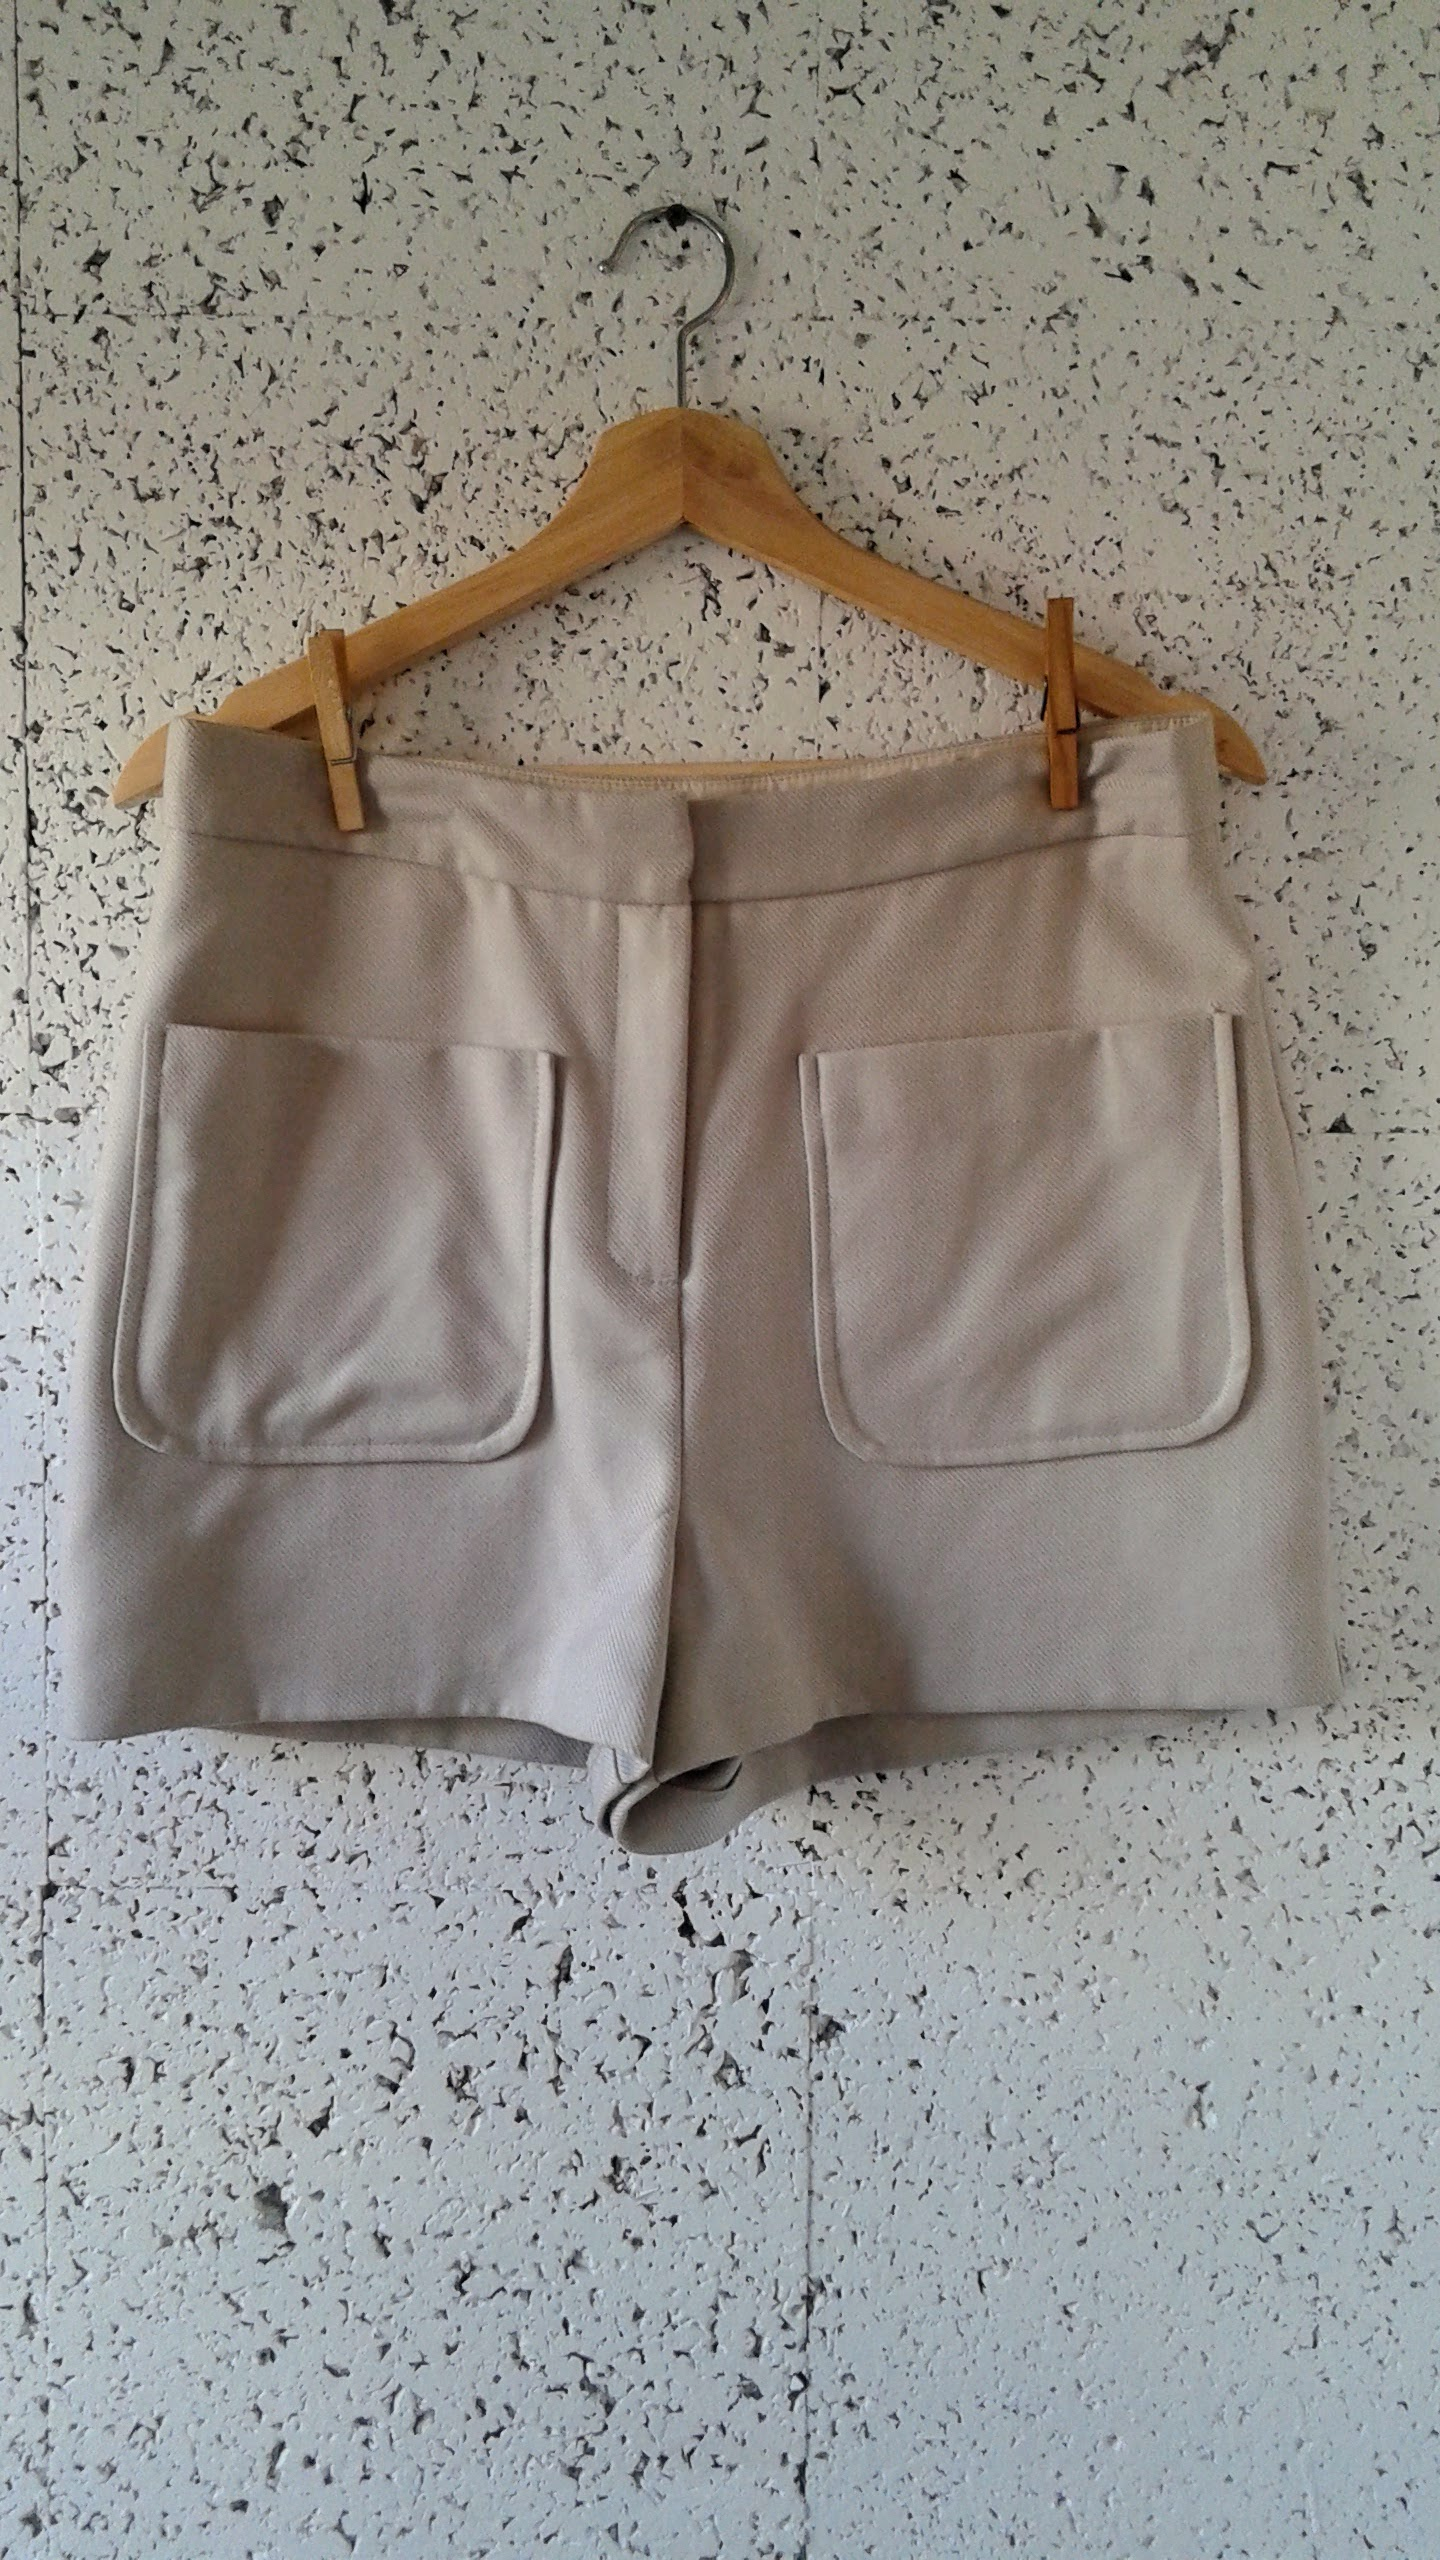 Topshop  shorts; Size 12, $18